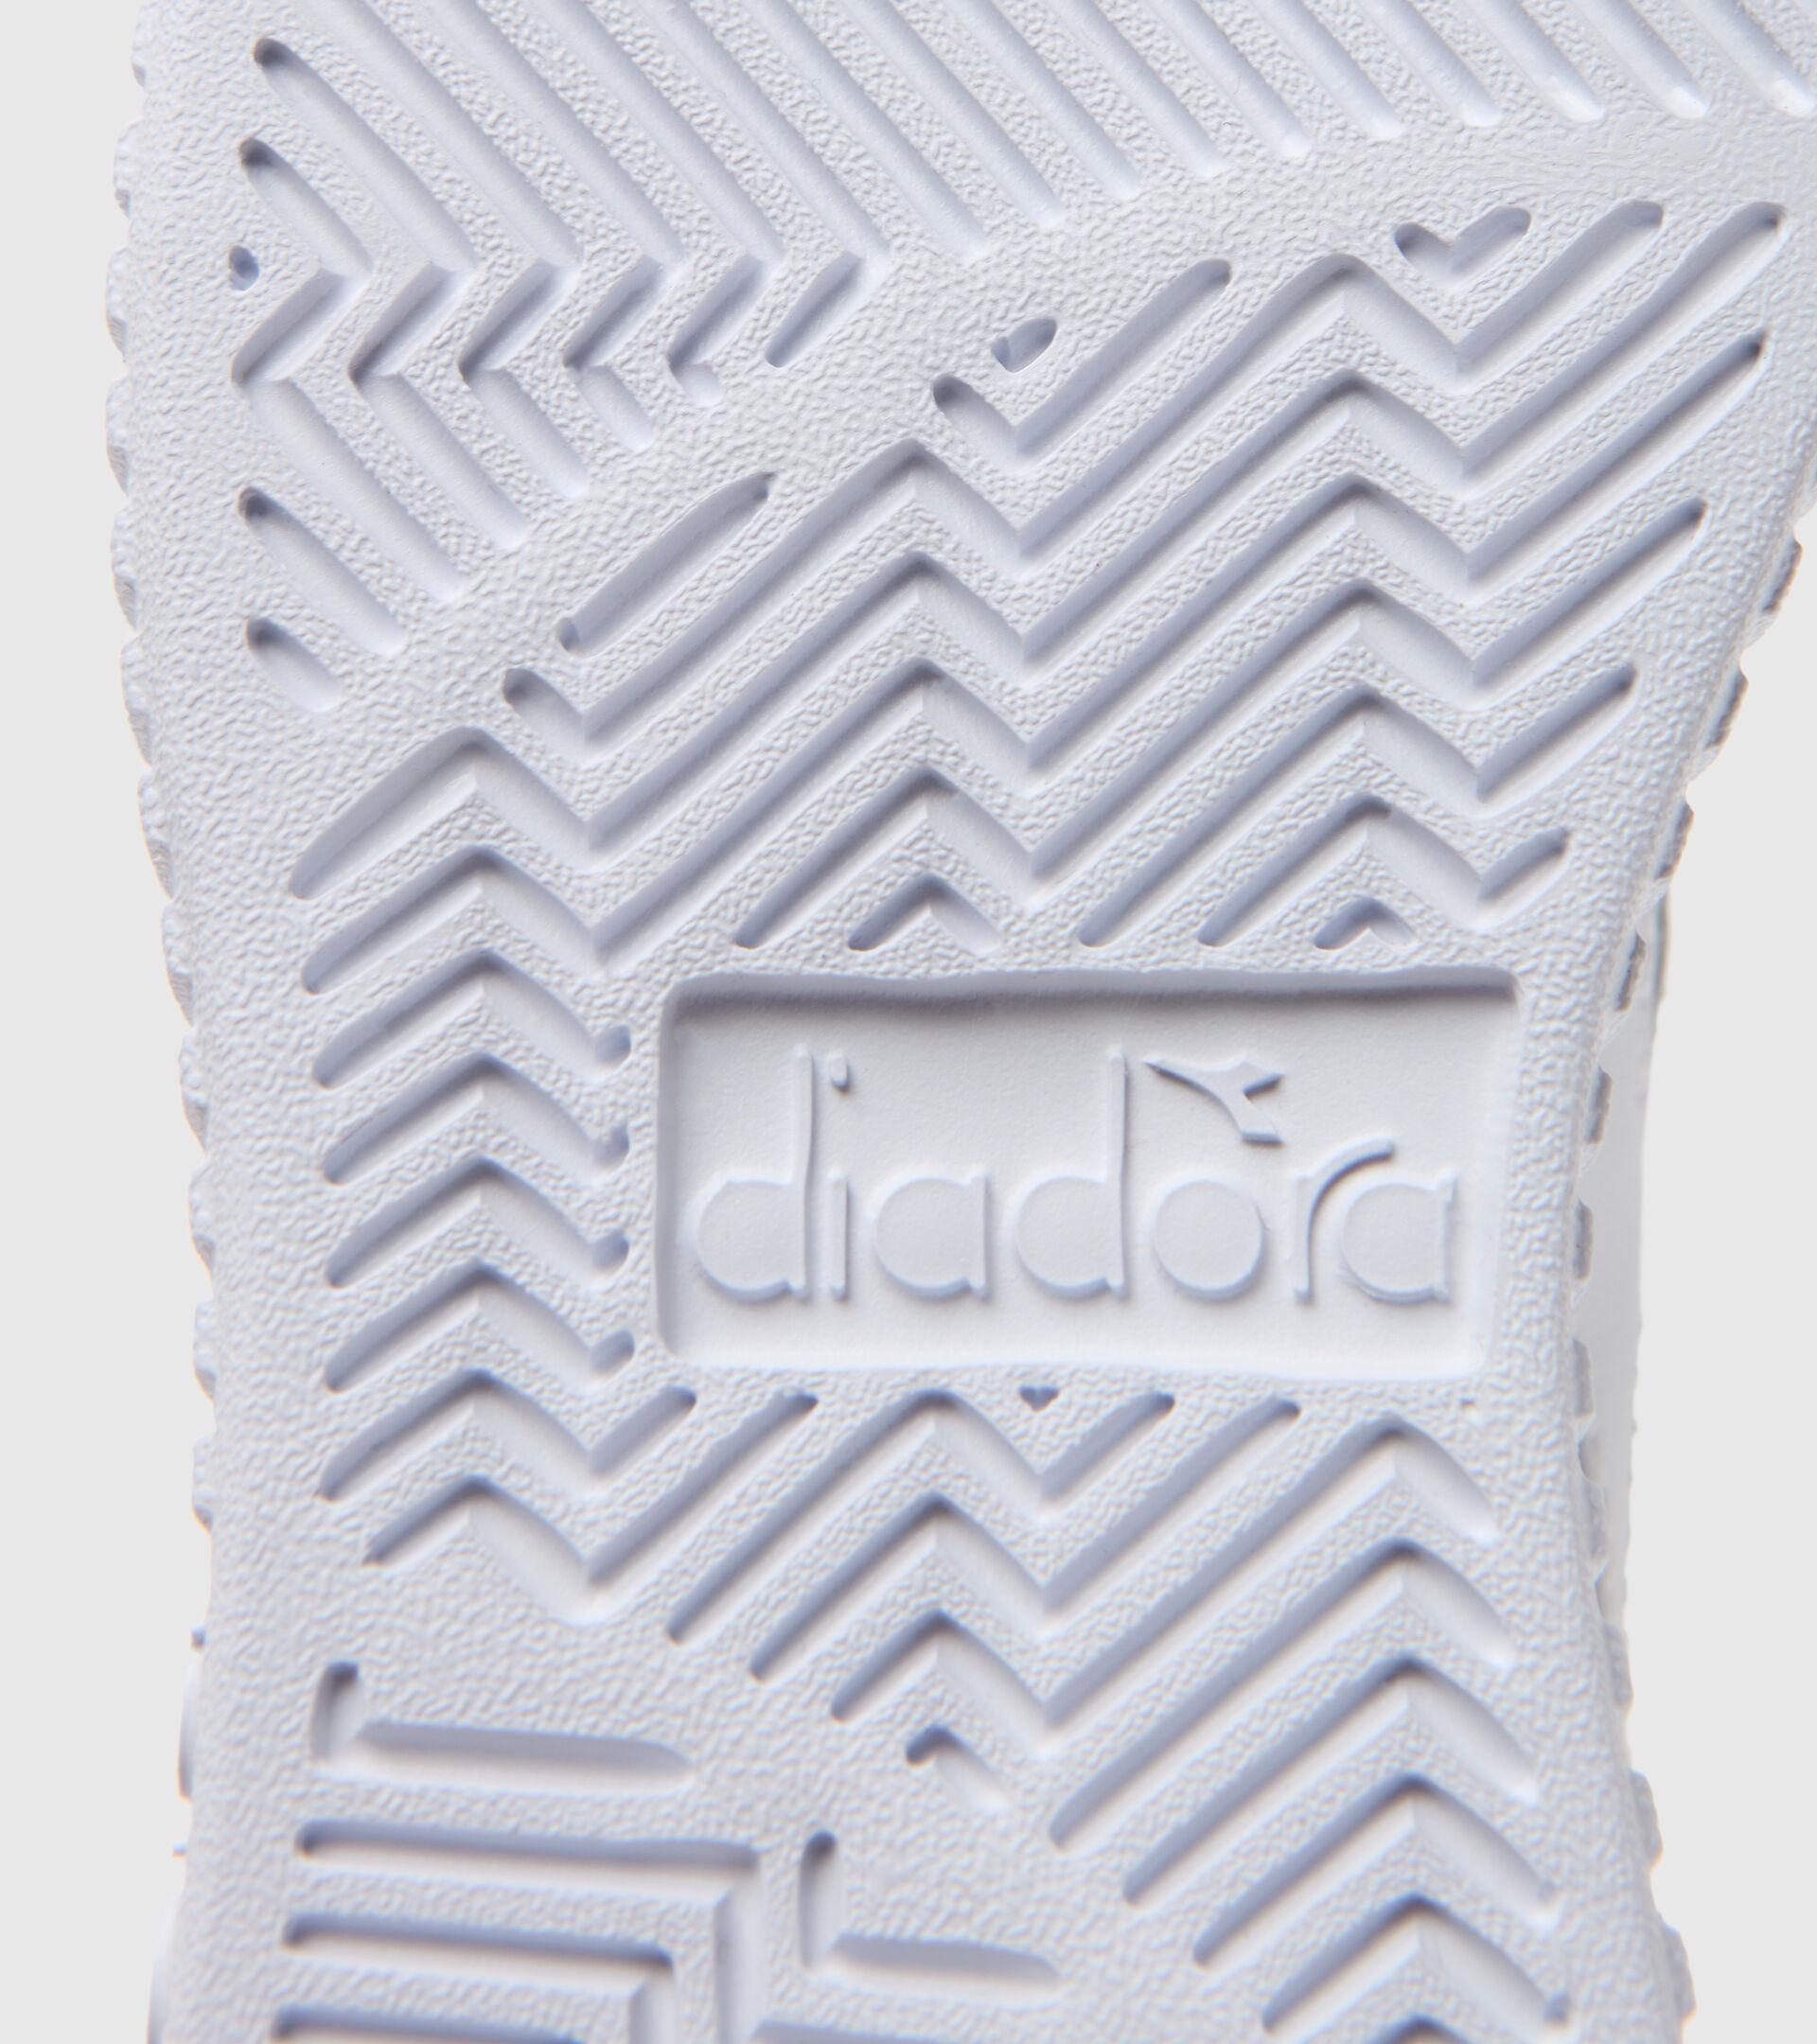 Chaussures de sport - Enfants 4-8 ans GAME STEP PS WEISS/ARGENT - Diadora